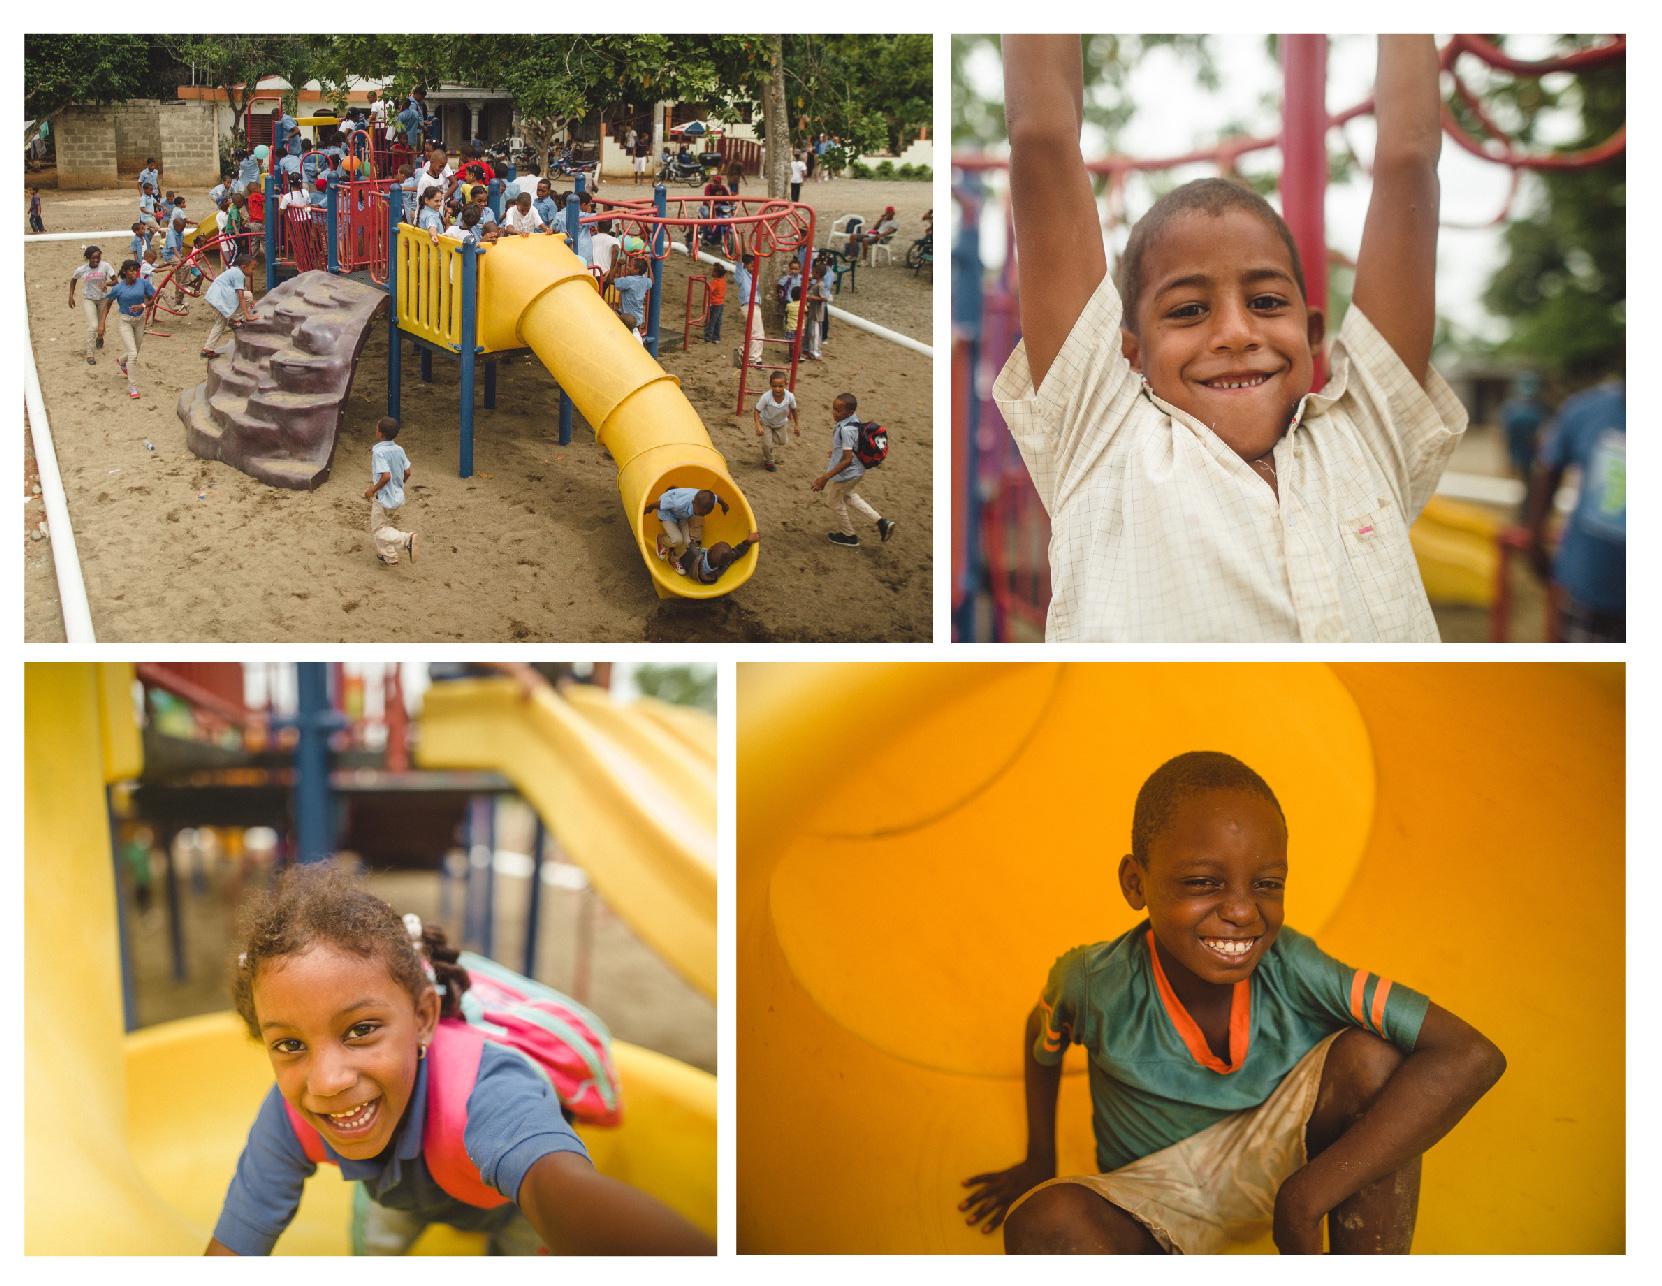 Dominican Republic playground collage